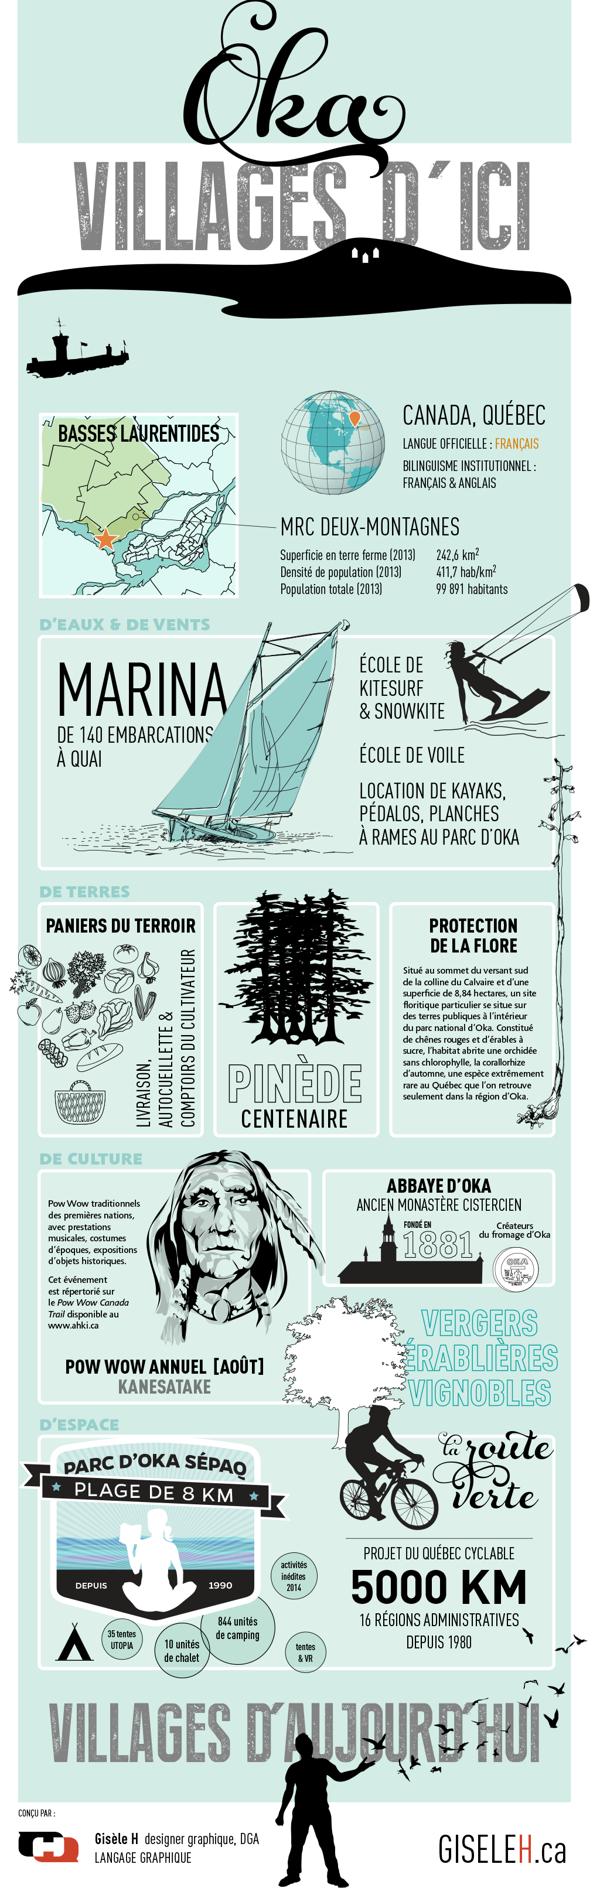 Organisateur graphique, infographic, village d'Oka by Gisele Henne, via Behance